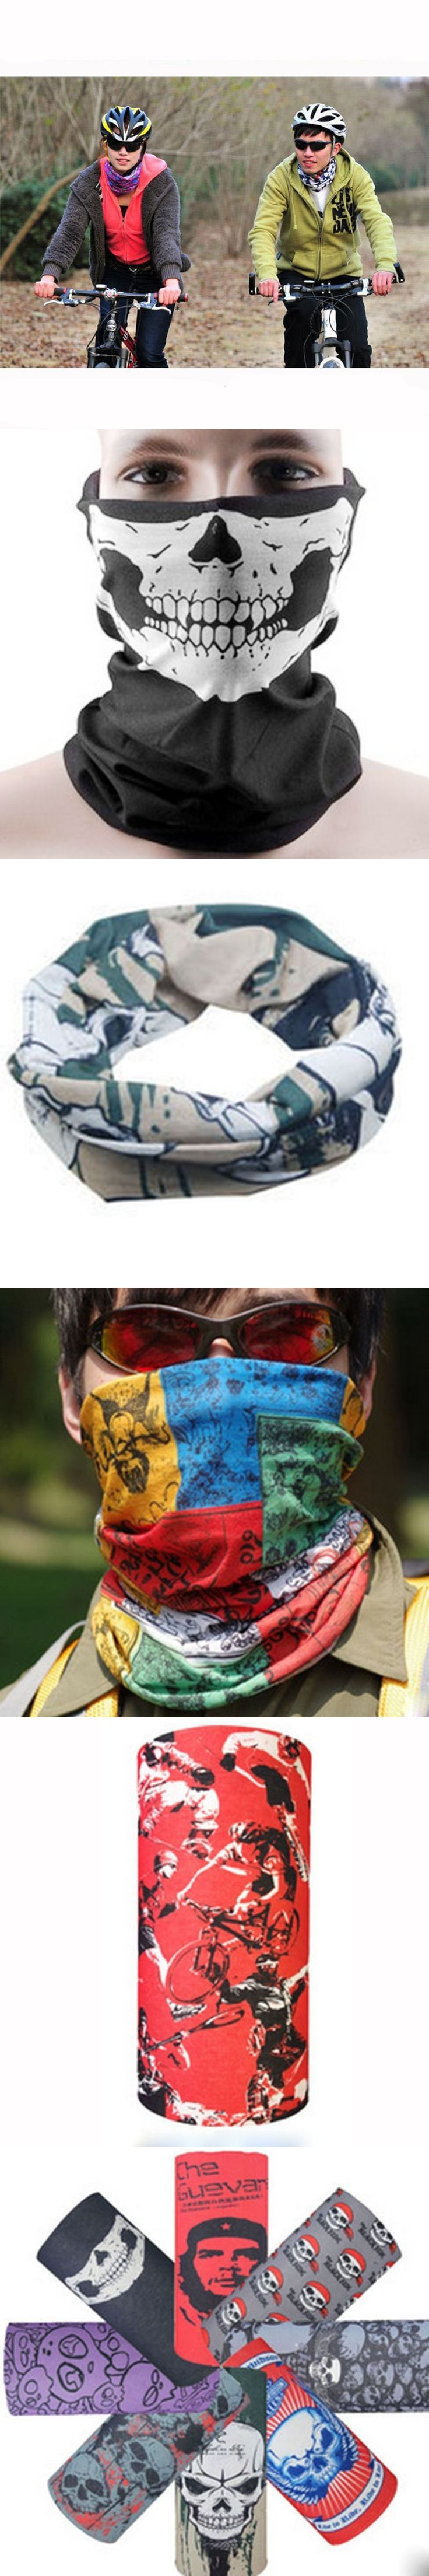 New Skull Bandana Bike Camouflage Tube Neck Face Mask Headscarf Sport Headband Pick Skull Print Bandanas